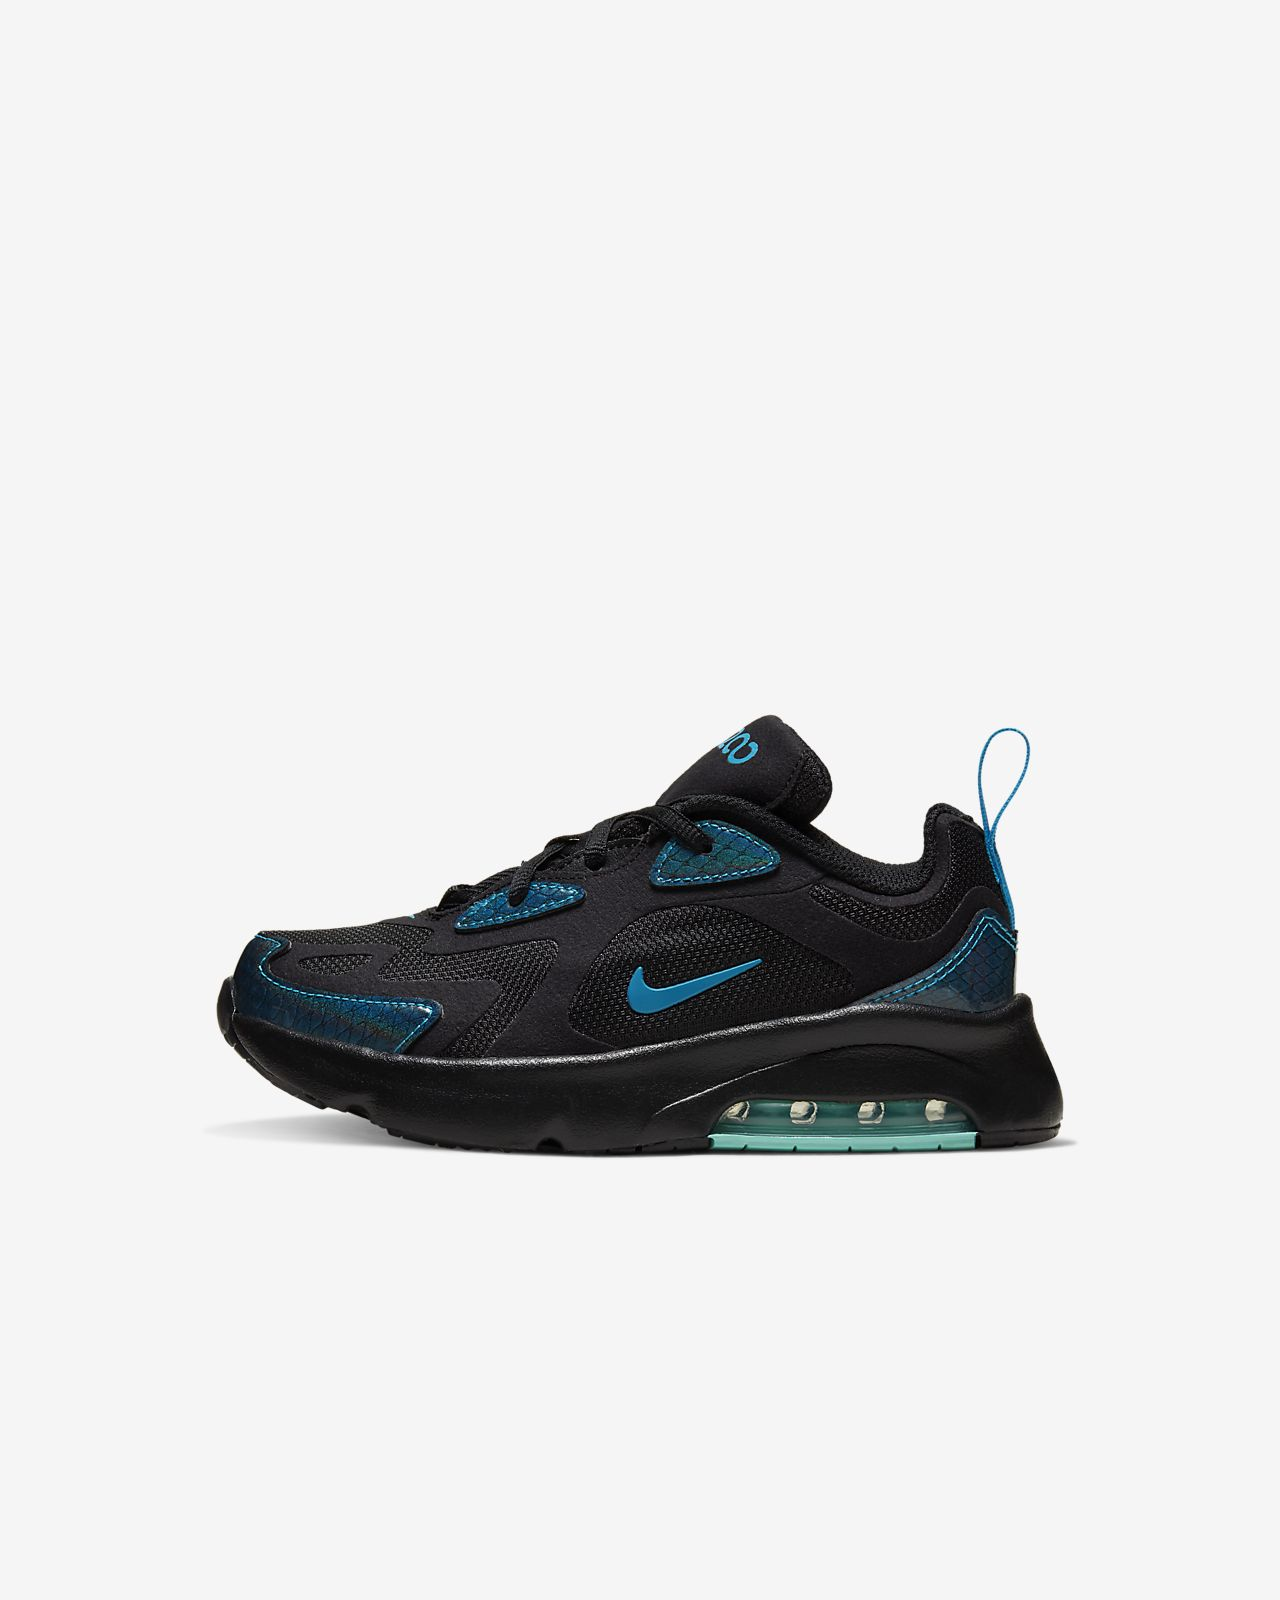 chaussures garcon 33 nike